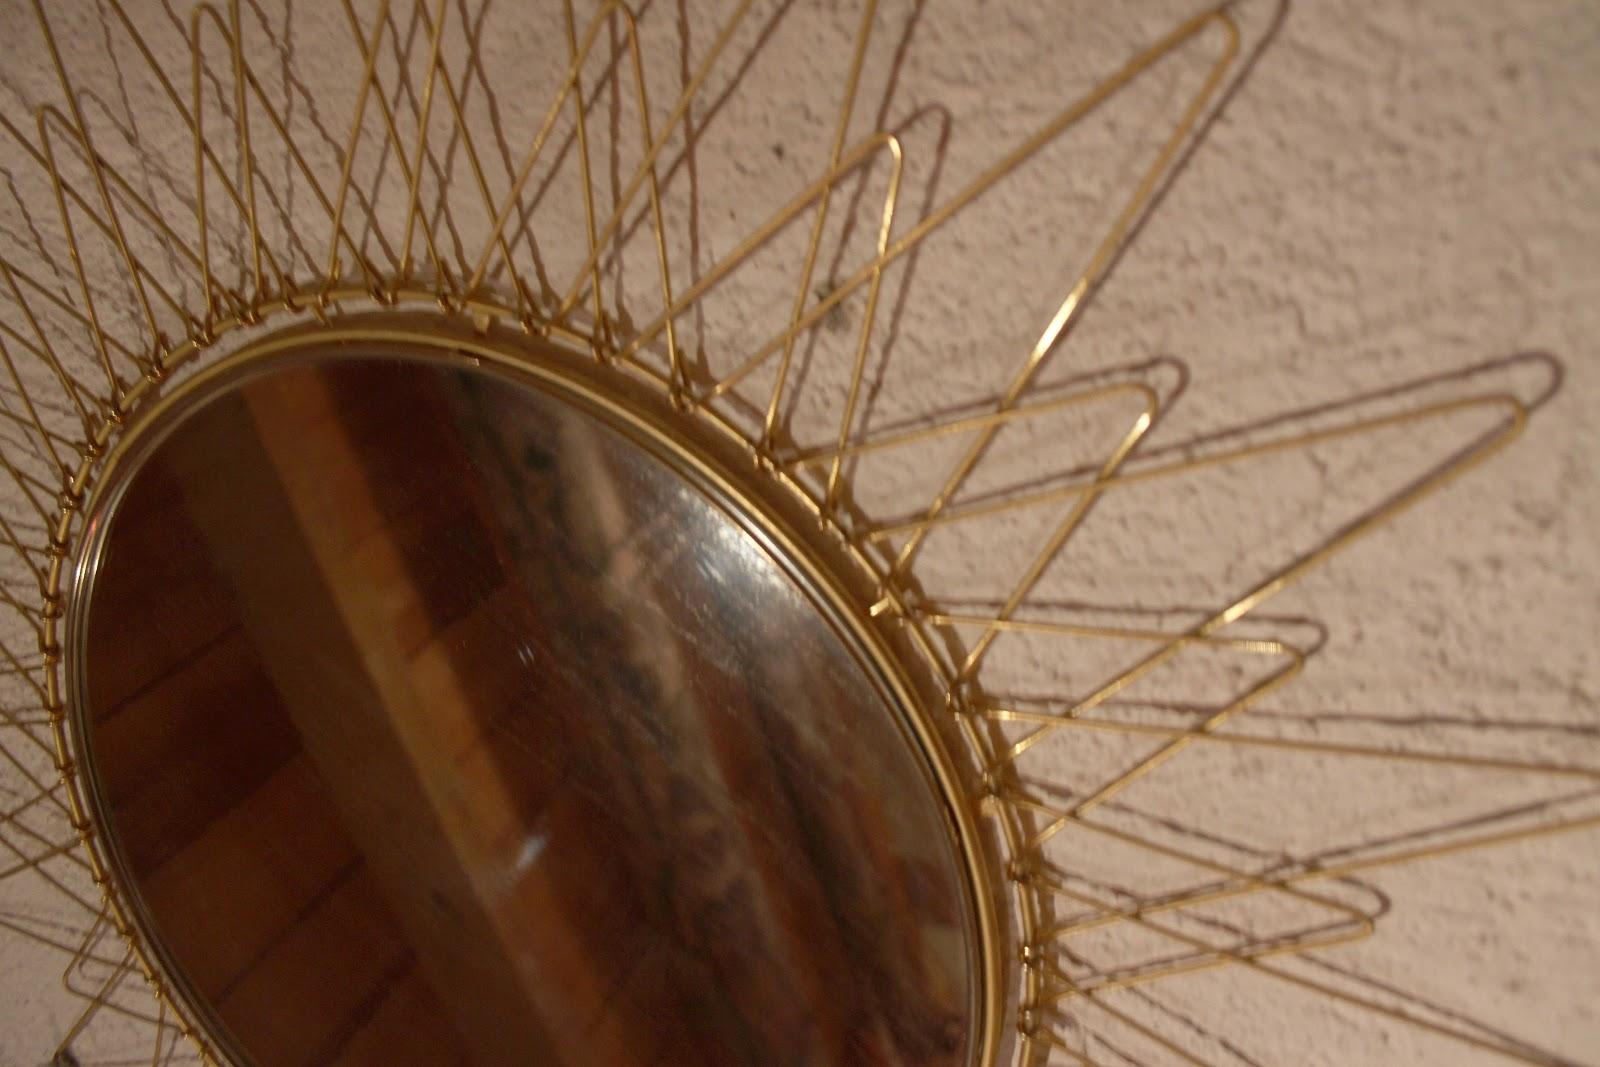 Chicbaazar objets vintage 50 60 70 superbe miroir soleil for Miroir 50 60